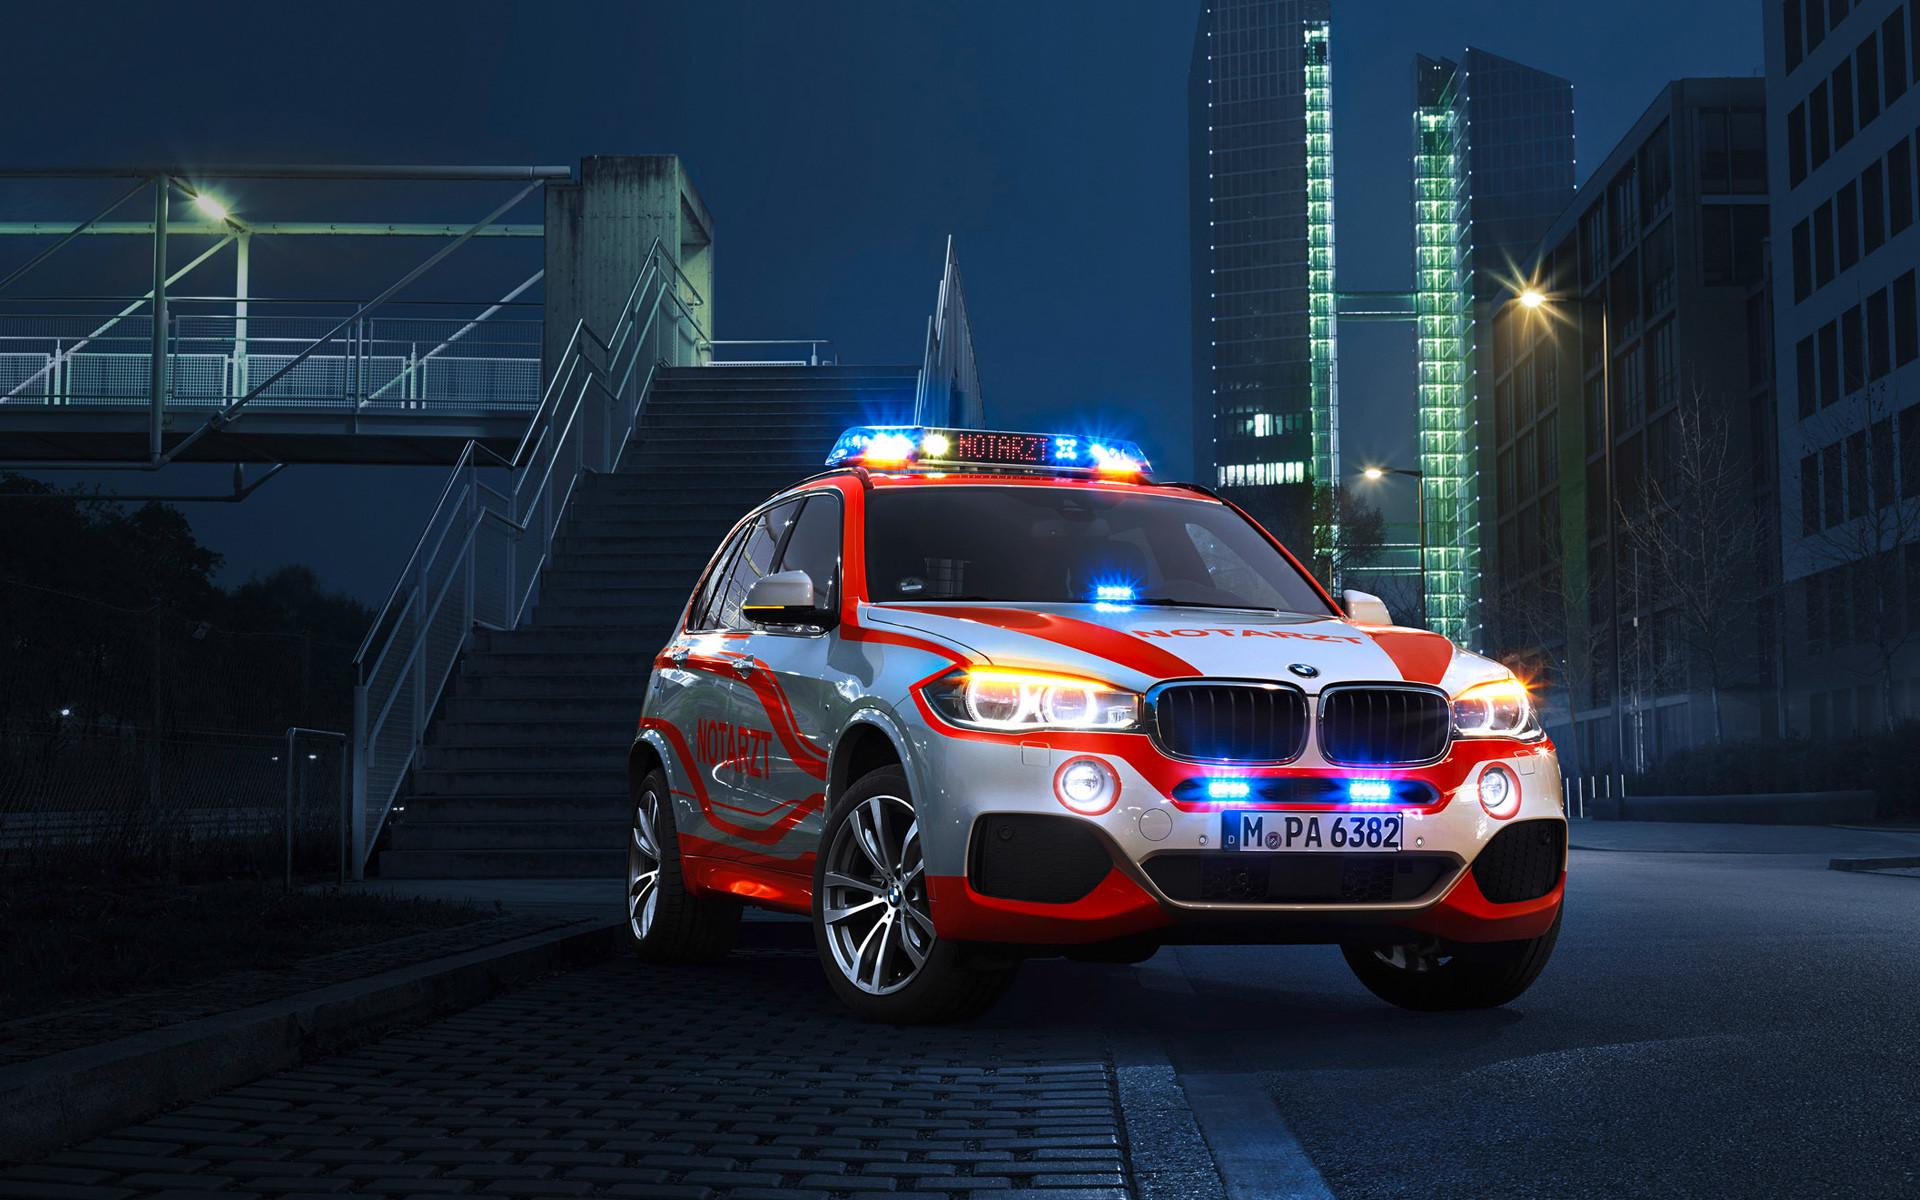 Bmw x3 paramedic vehicle wallpaper hd car wallpapers jpg Funny ems  wallpapers